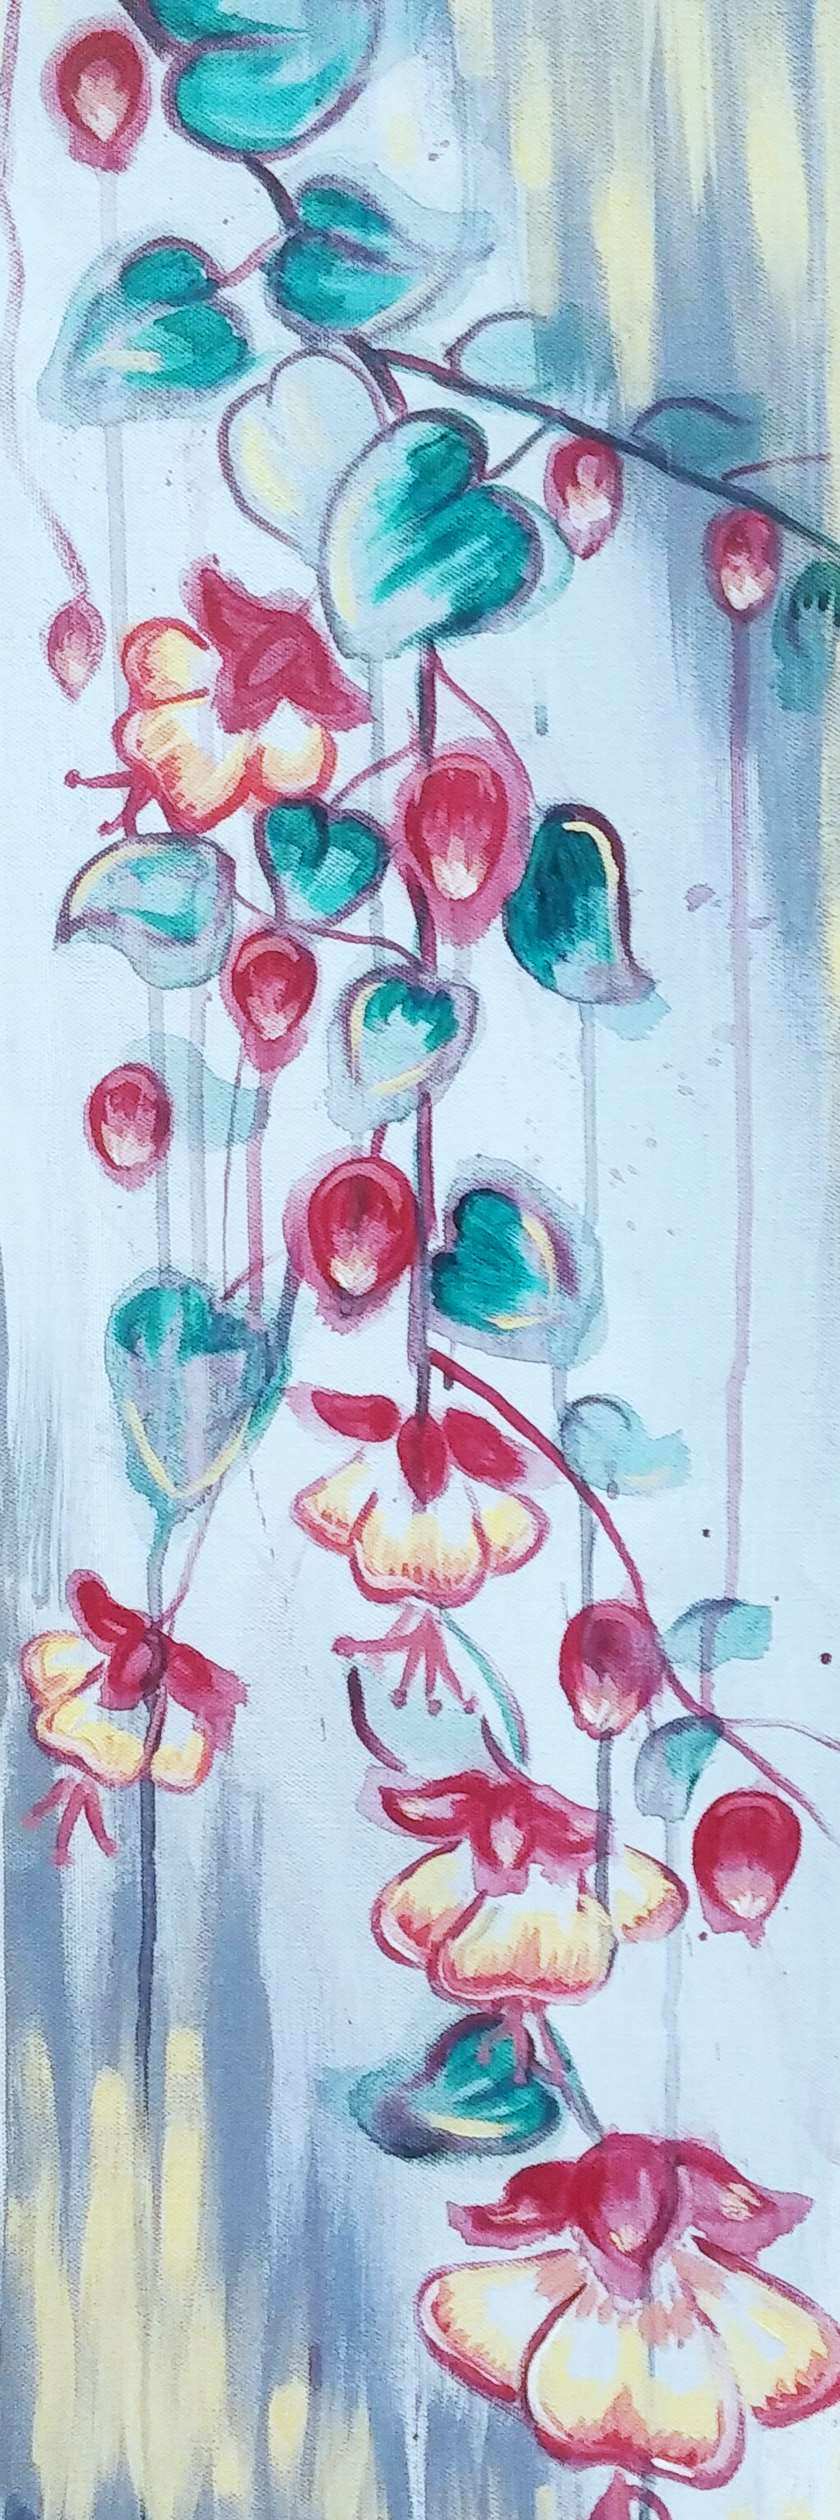 Fuchsia in the Rain